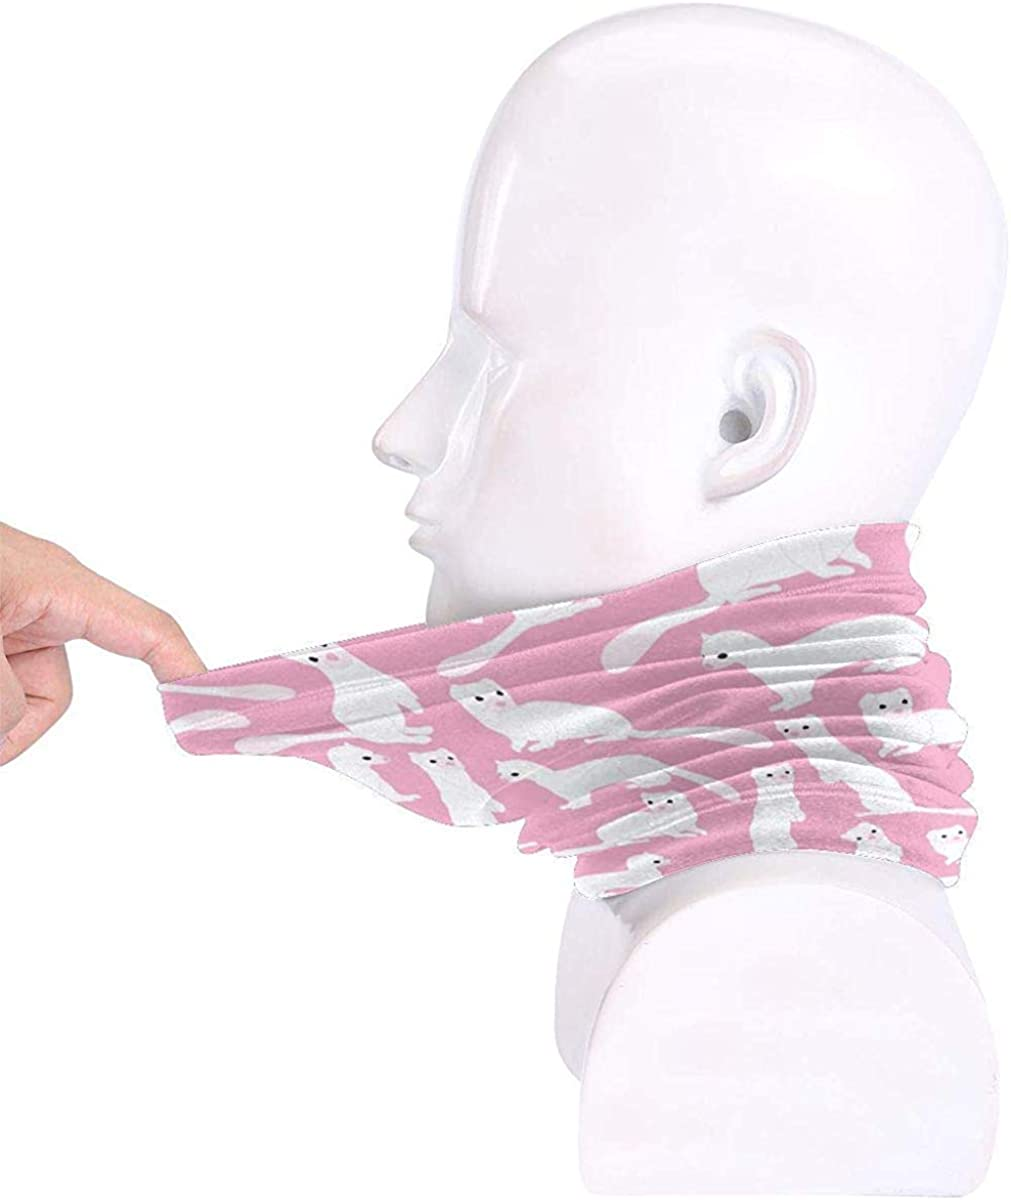 White Weasel Microfiber Neck Warmer Balaclavas Soft Fleece Headwear Face Scarf Mask for Winter